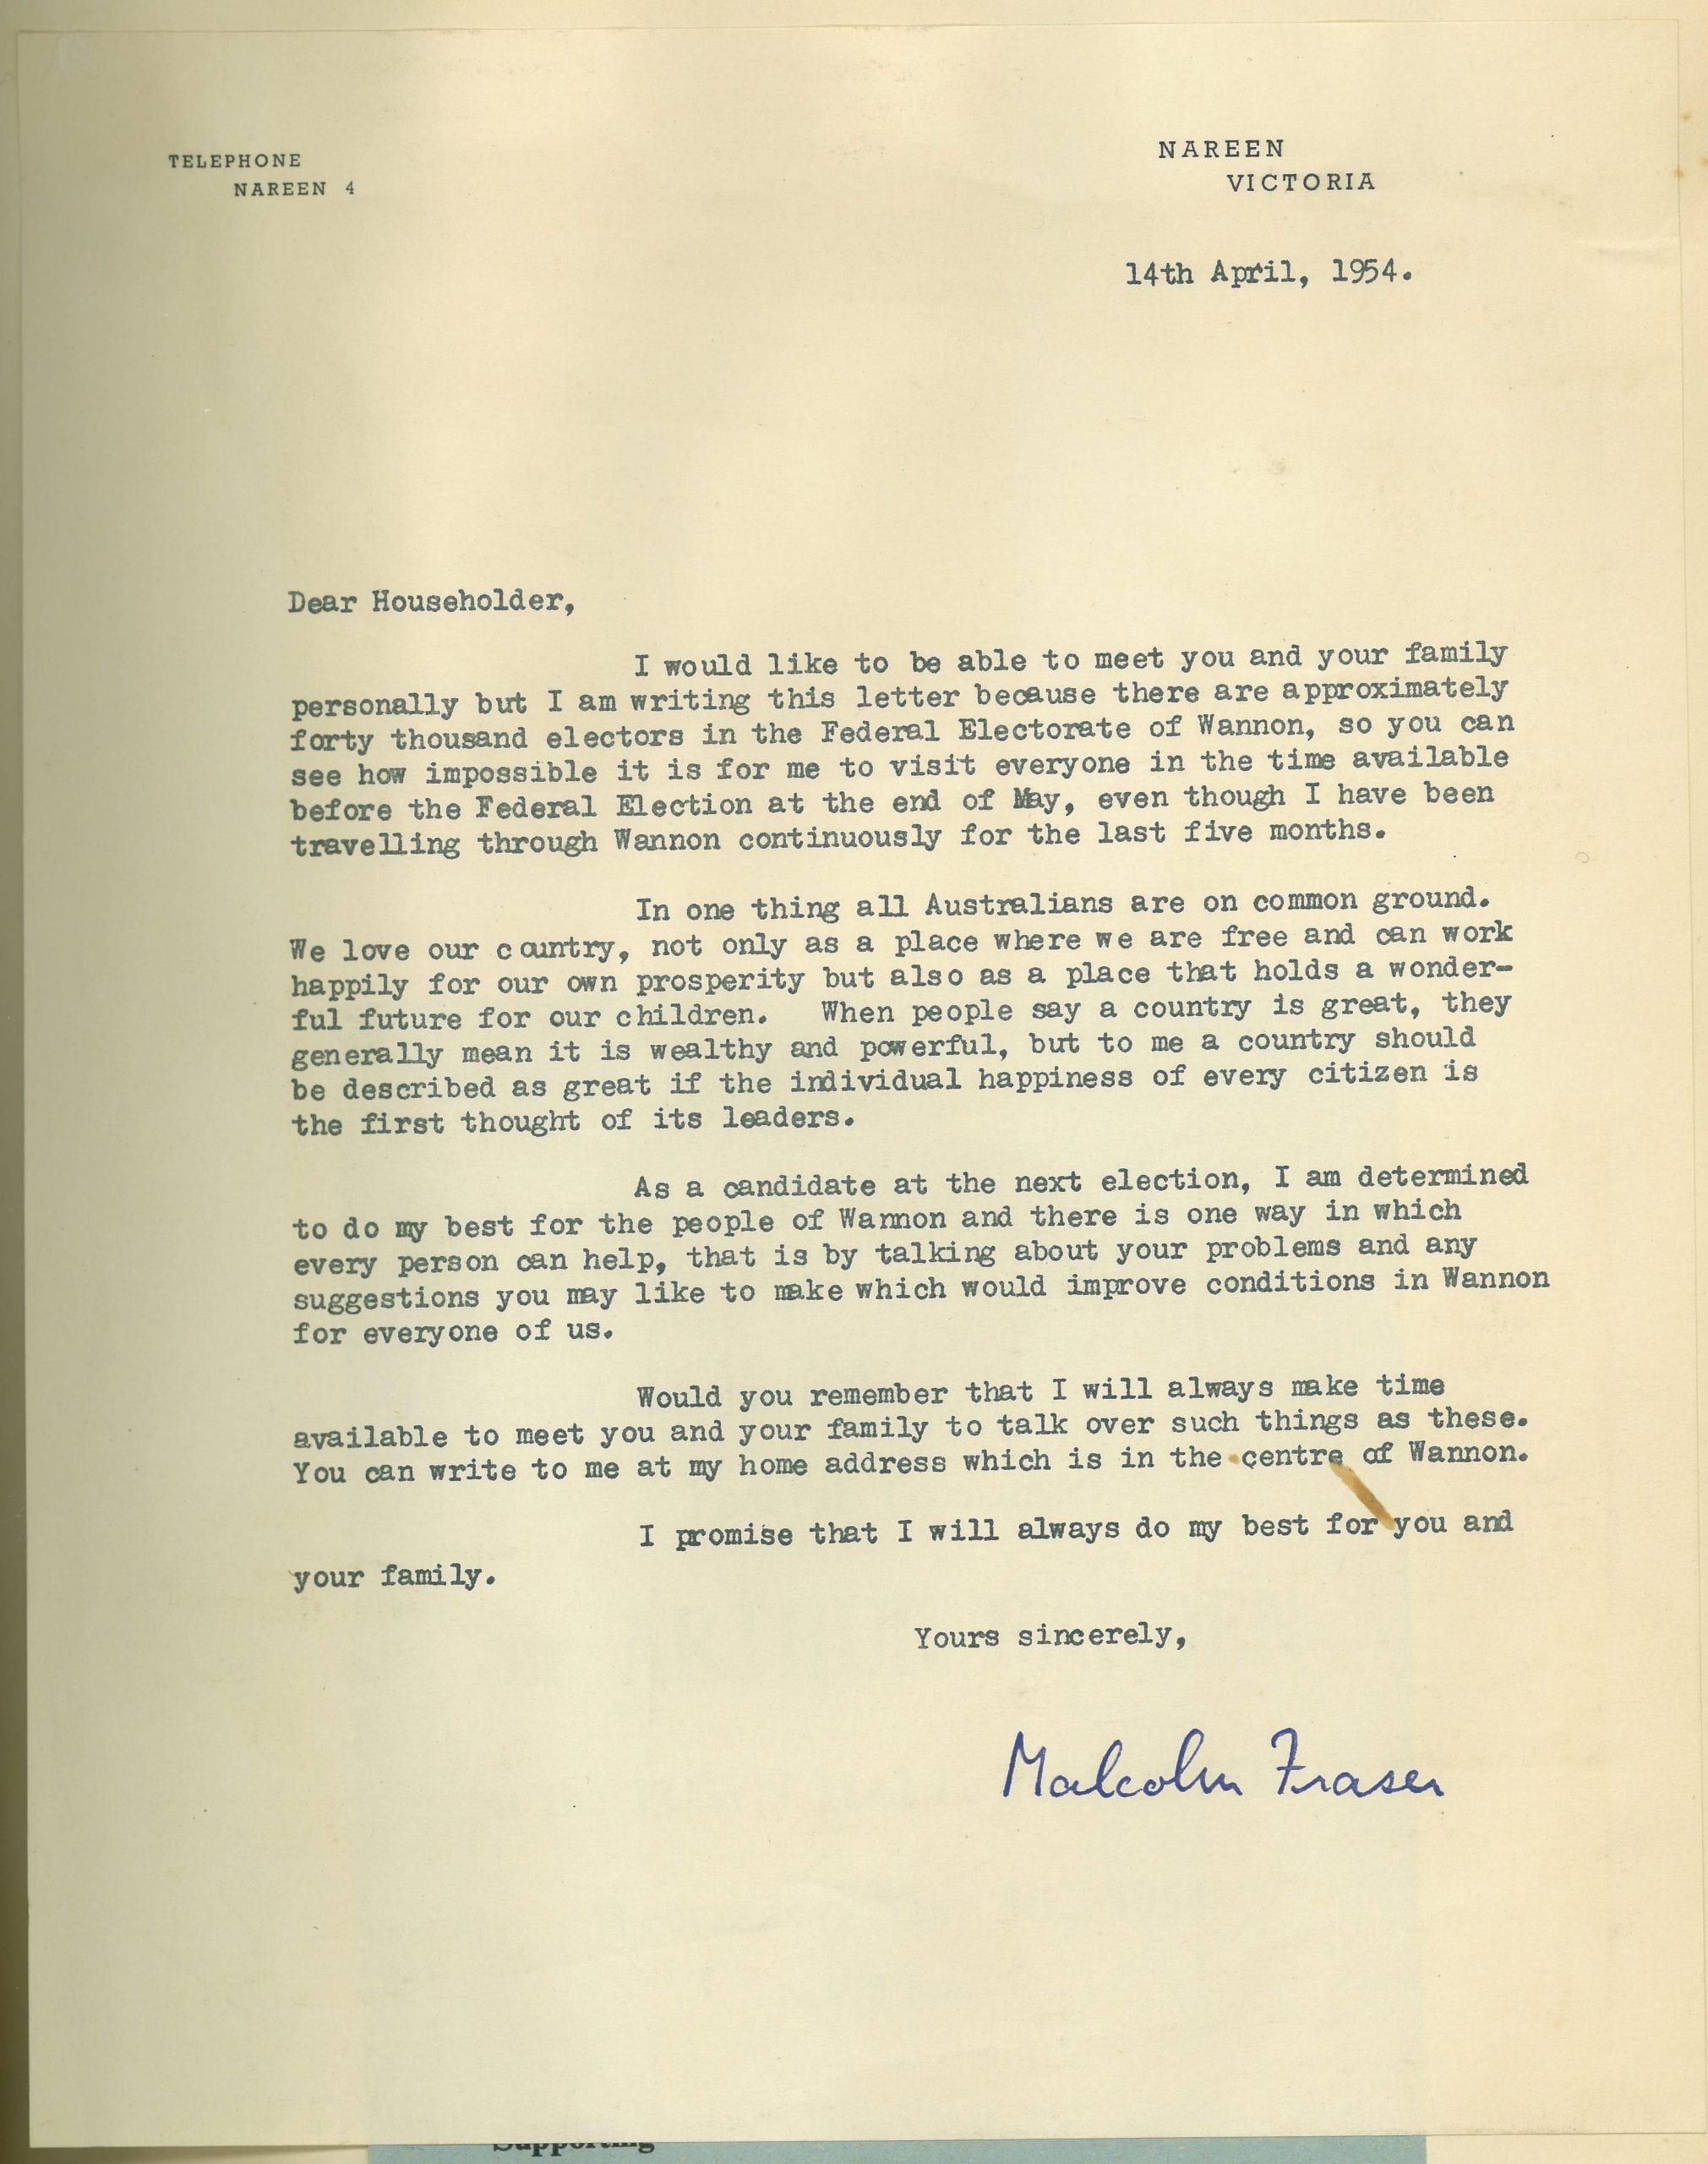 Electorate letter from Malcolm Fraser, 14 April, 1954